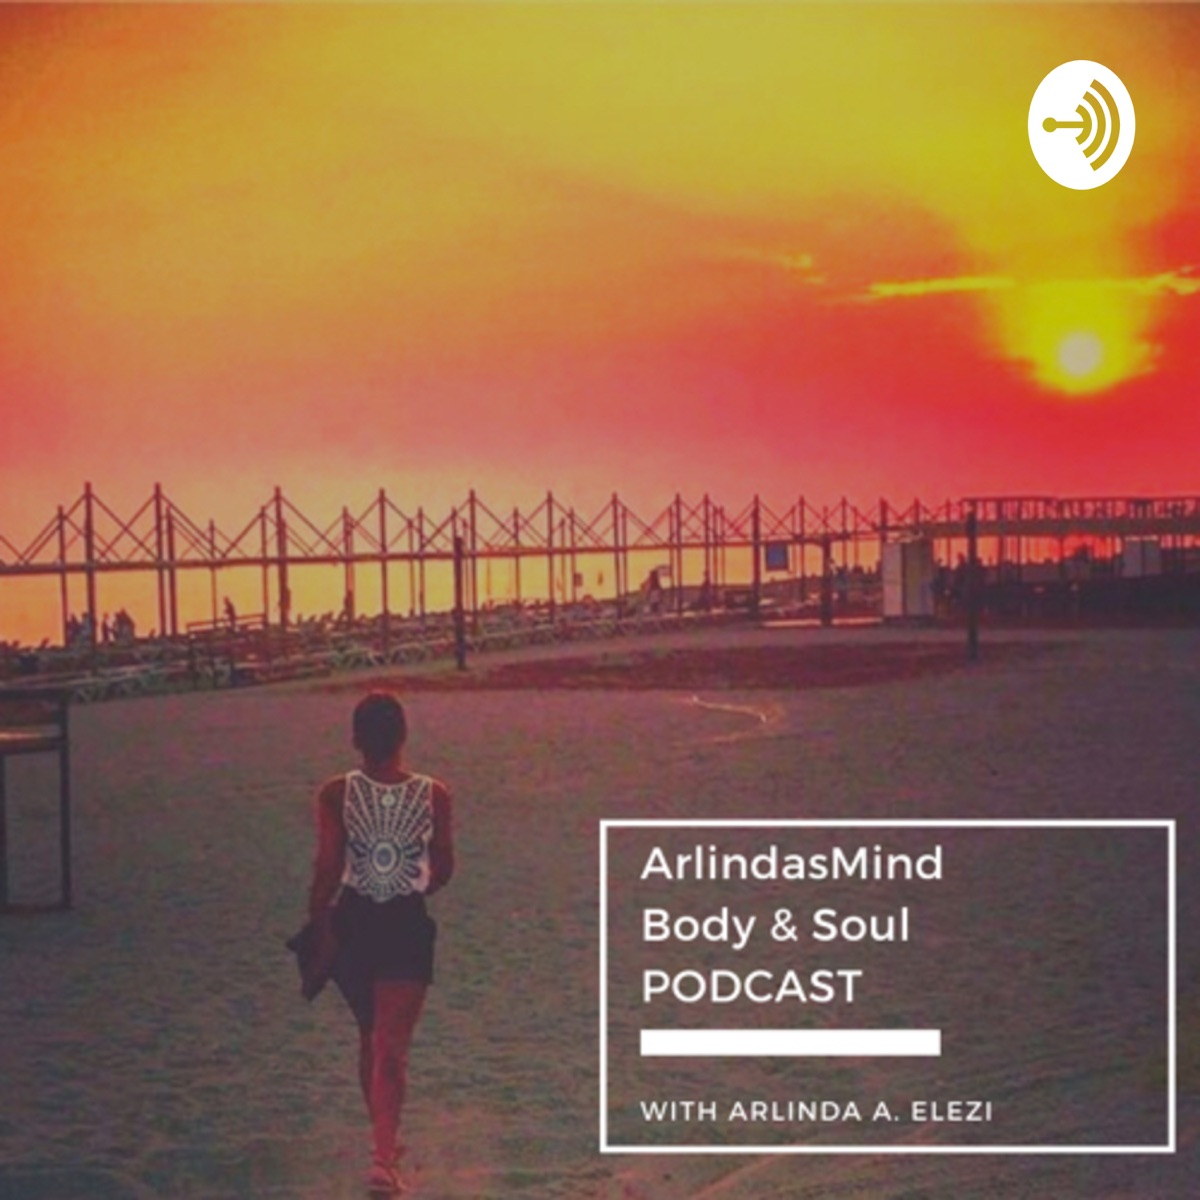 ArlindasMind, Body & Soul